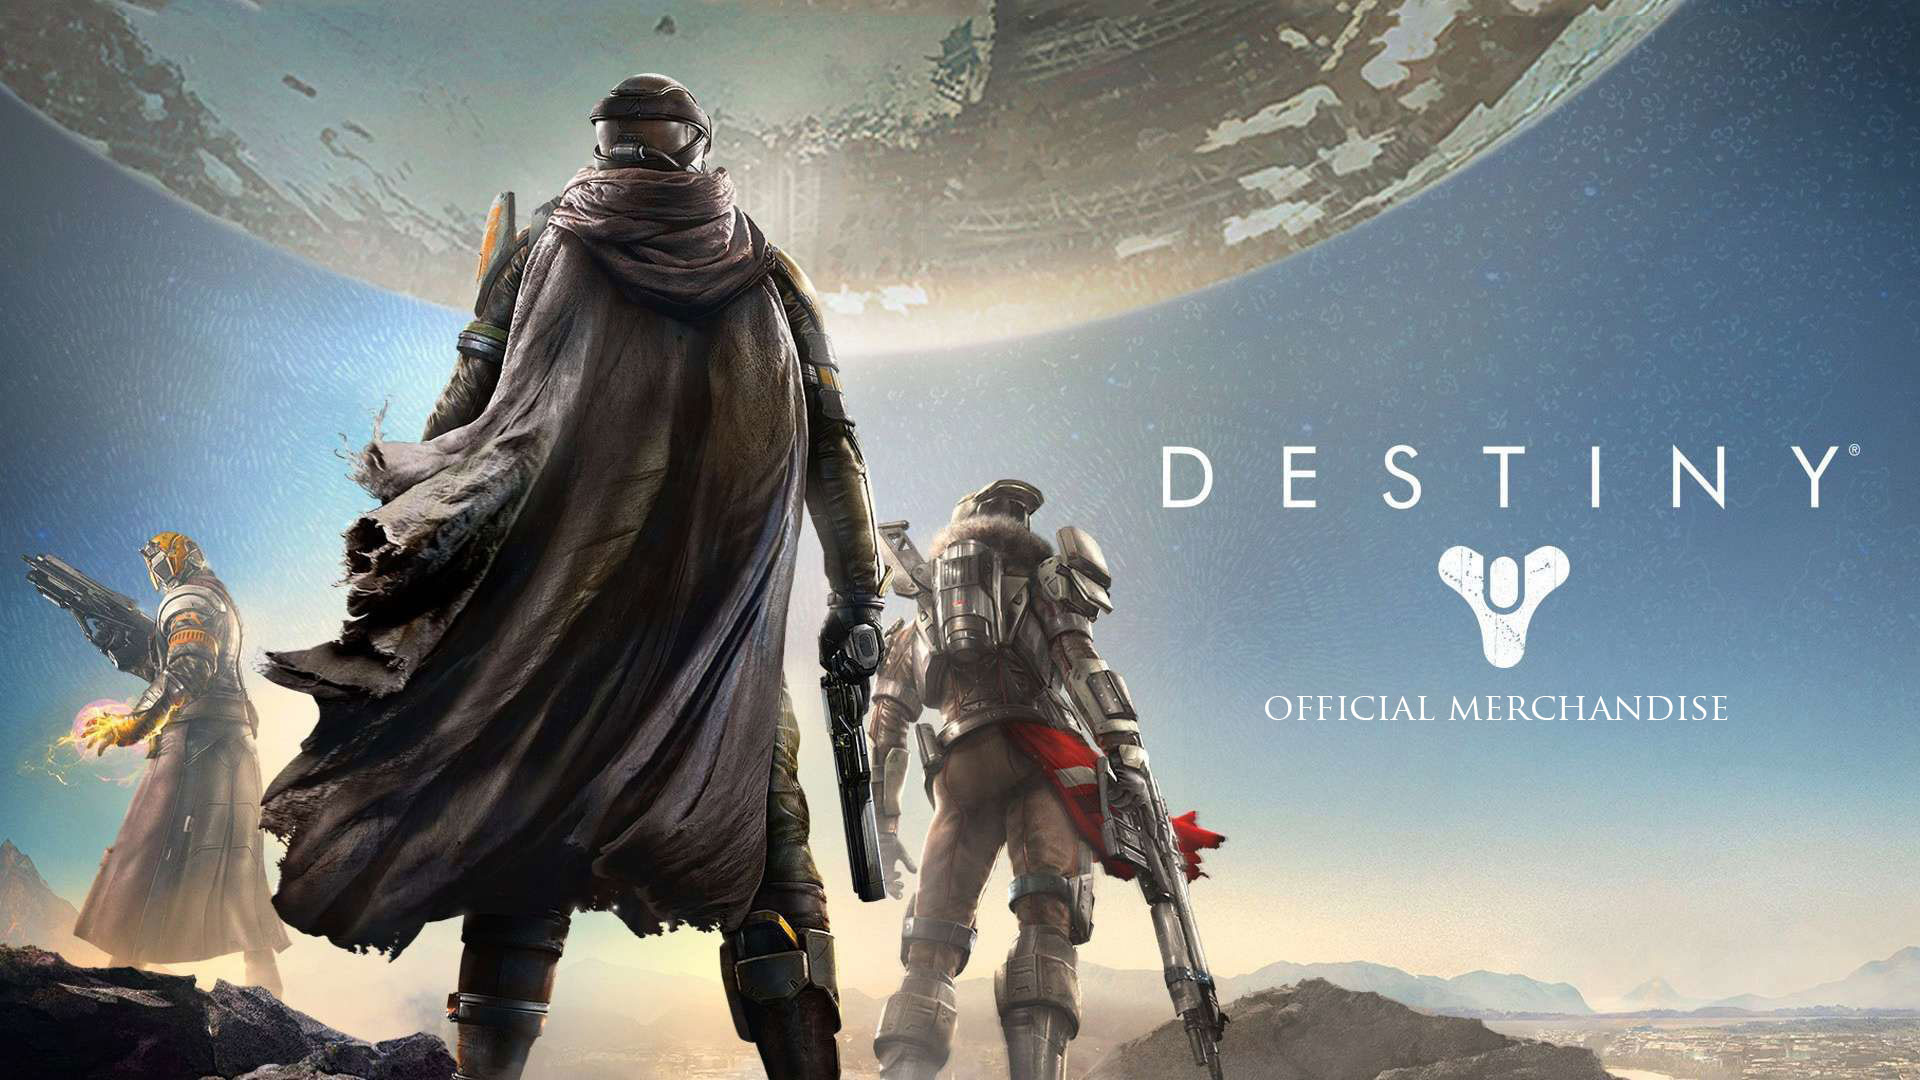 Destiny Game Official Poster